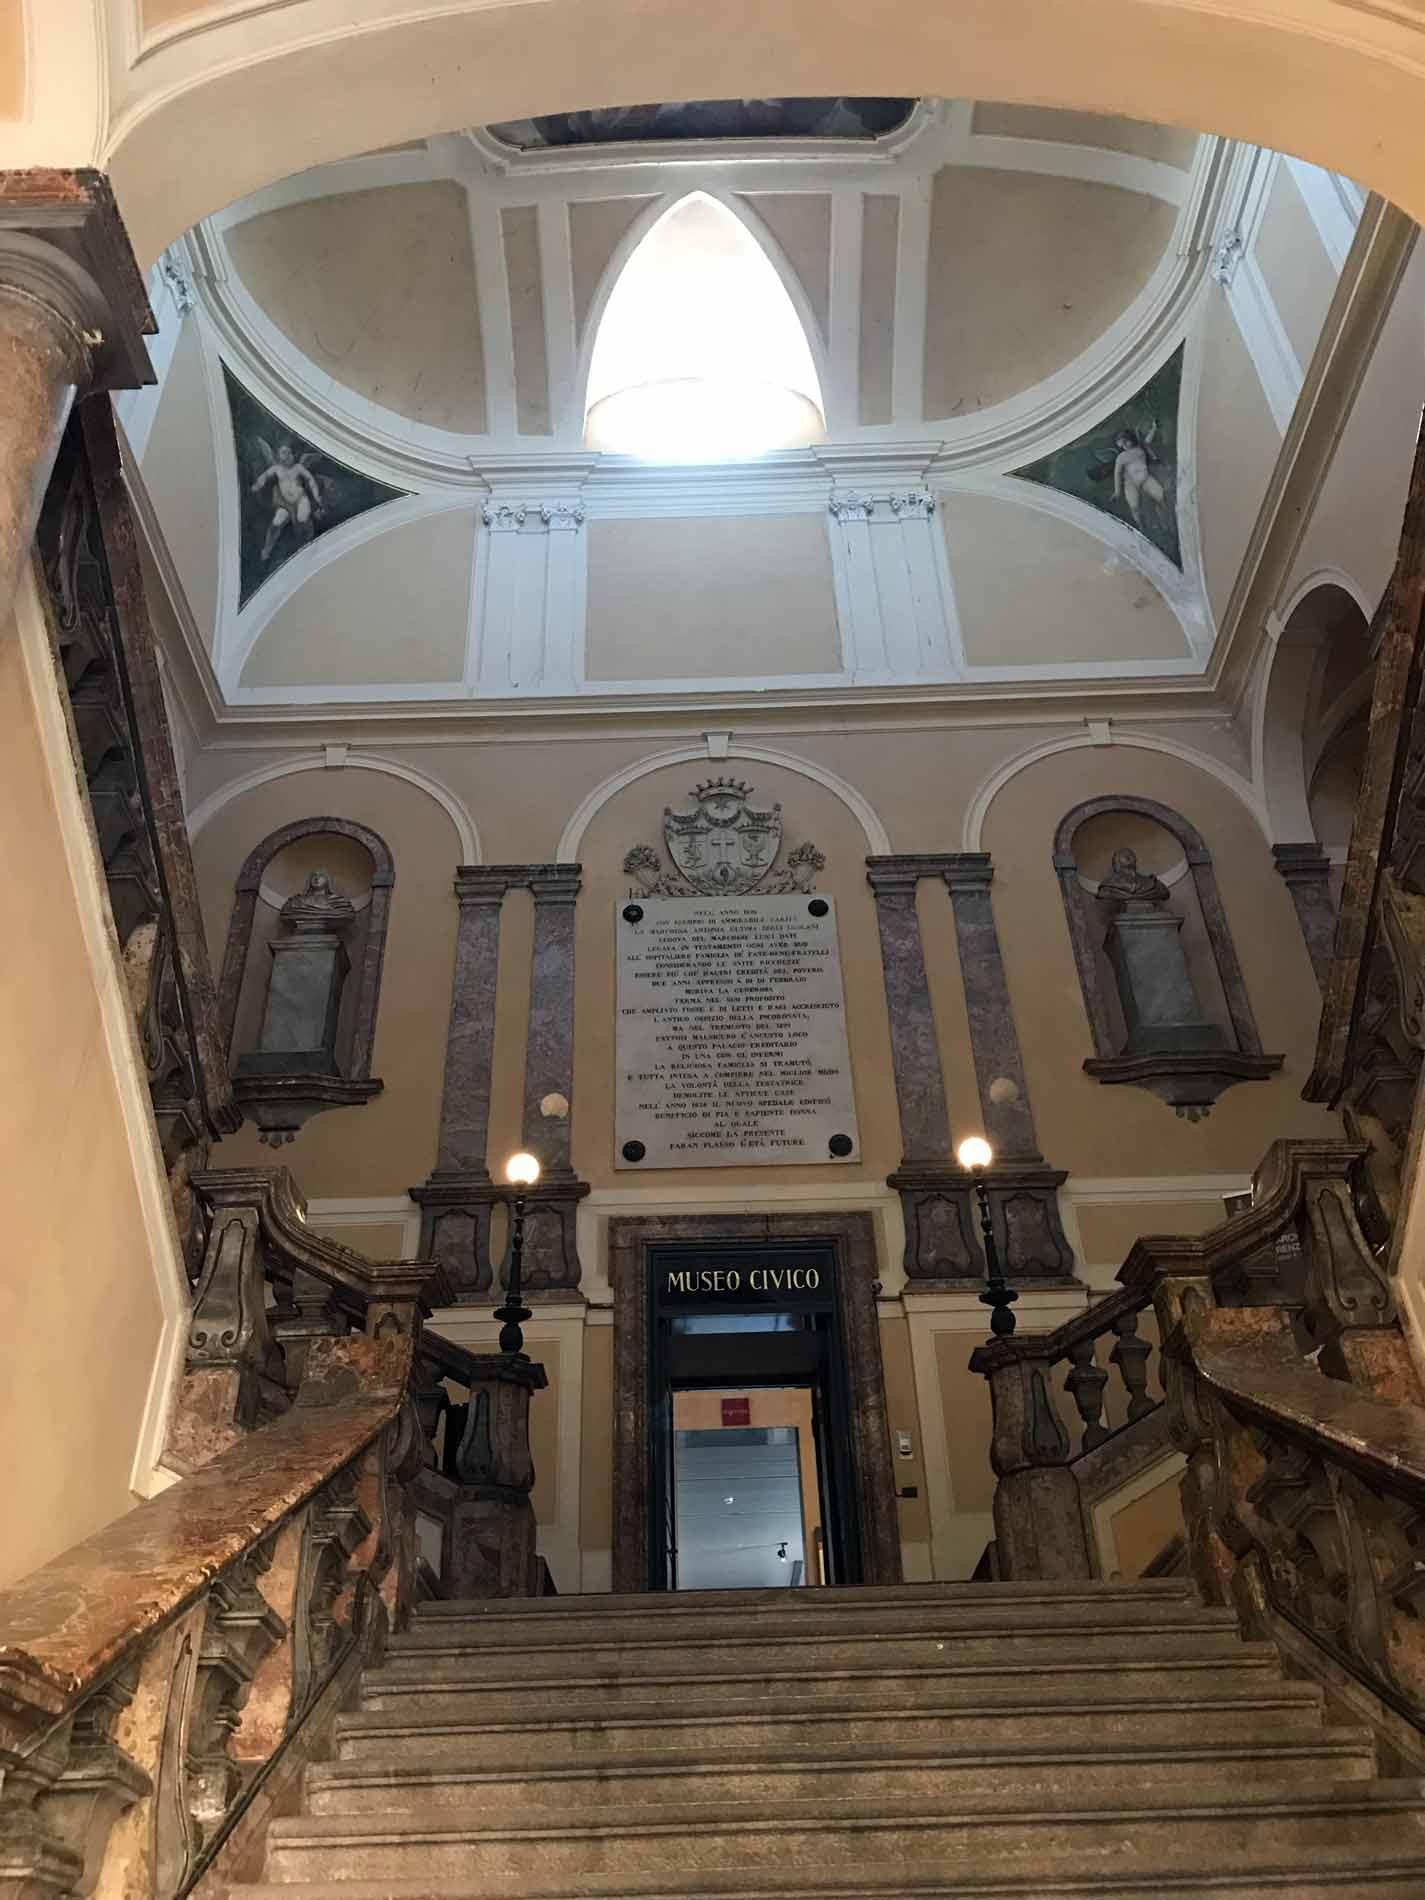 Museo-civico-ala-ponzone-cremona-scalinata-marmo-ingresso-museo